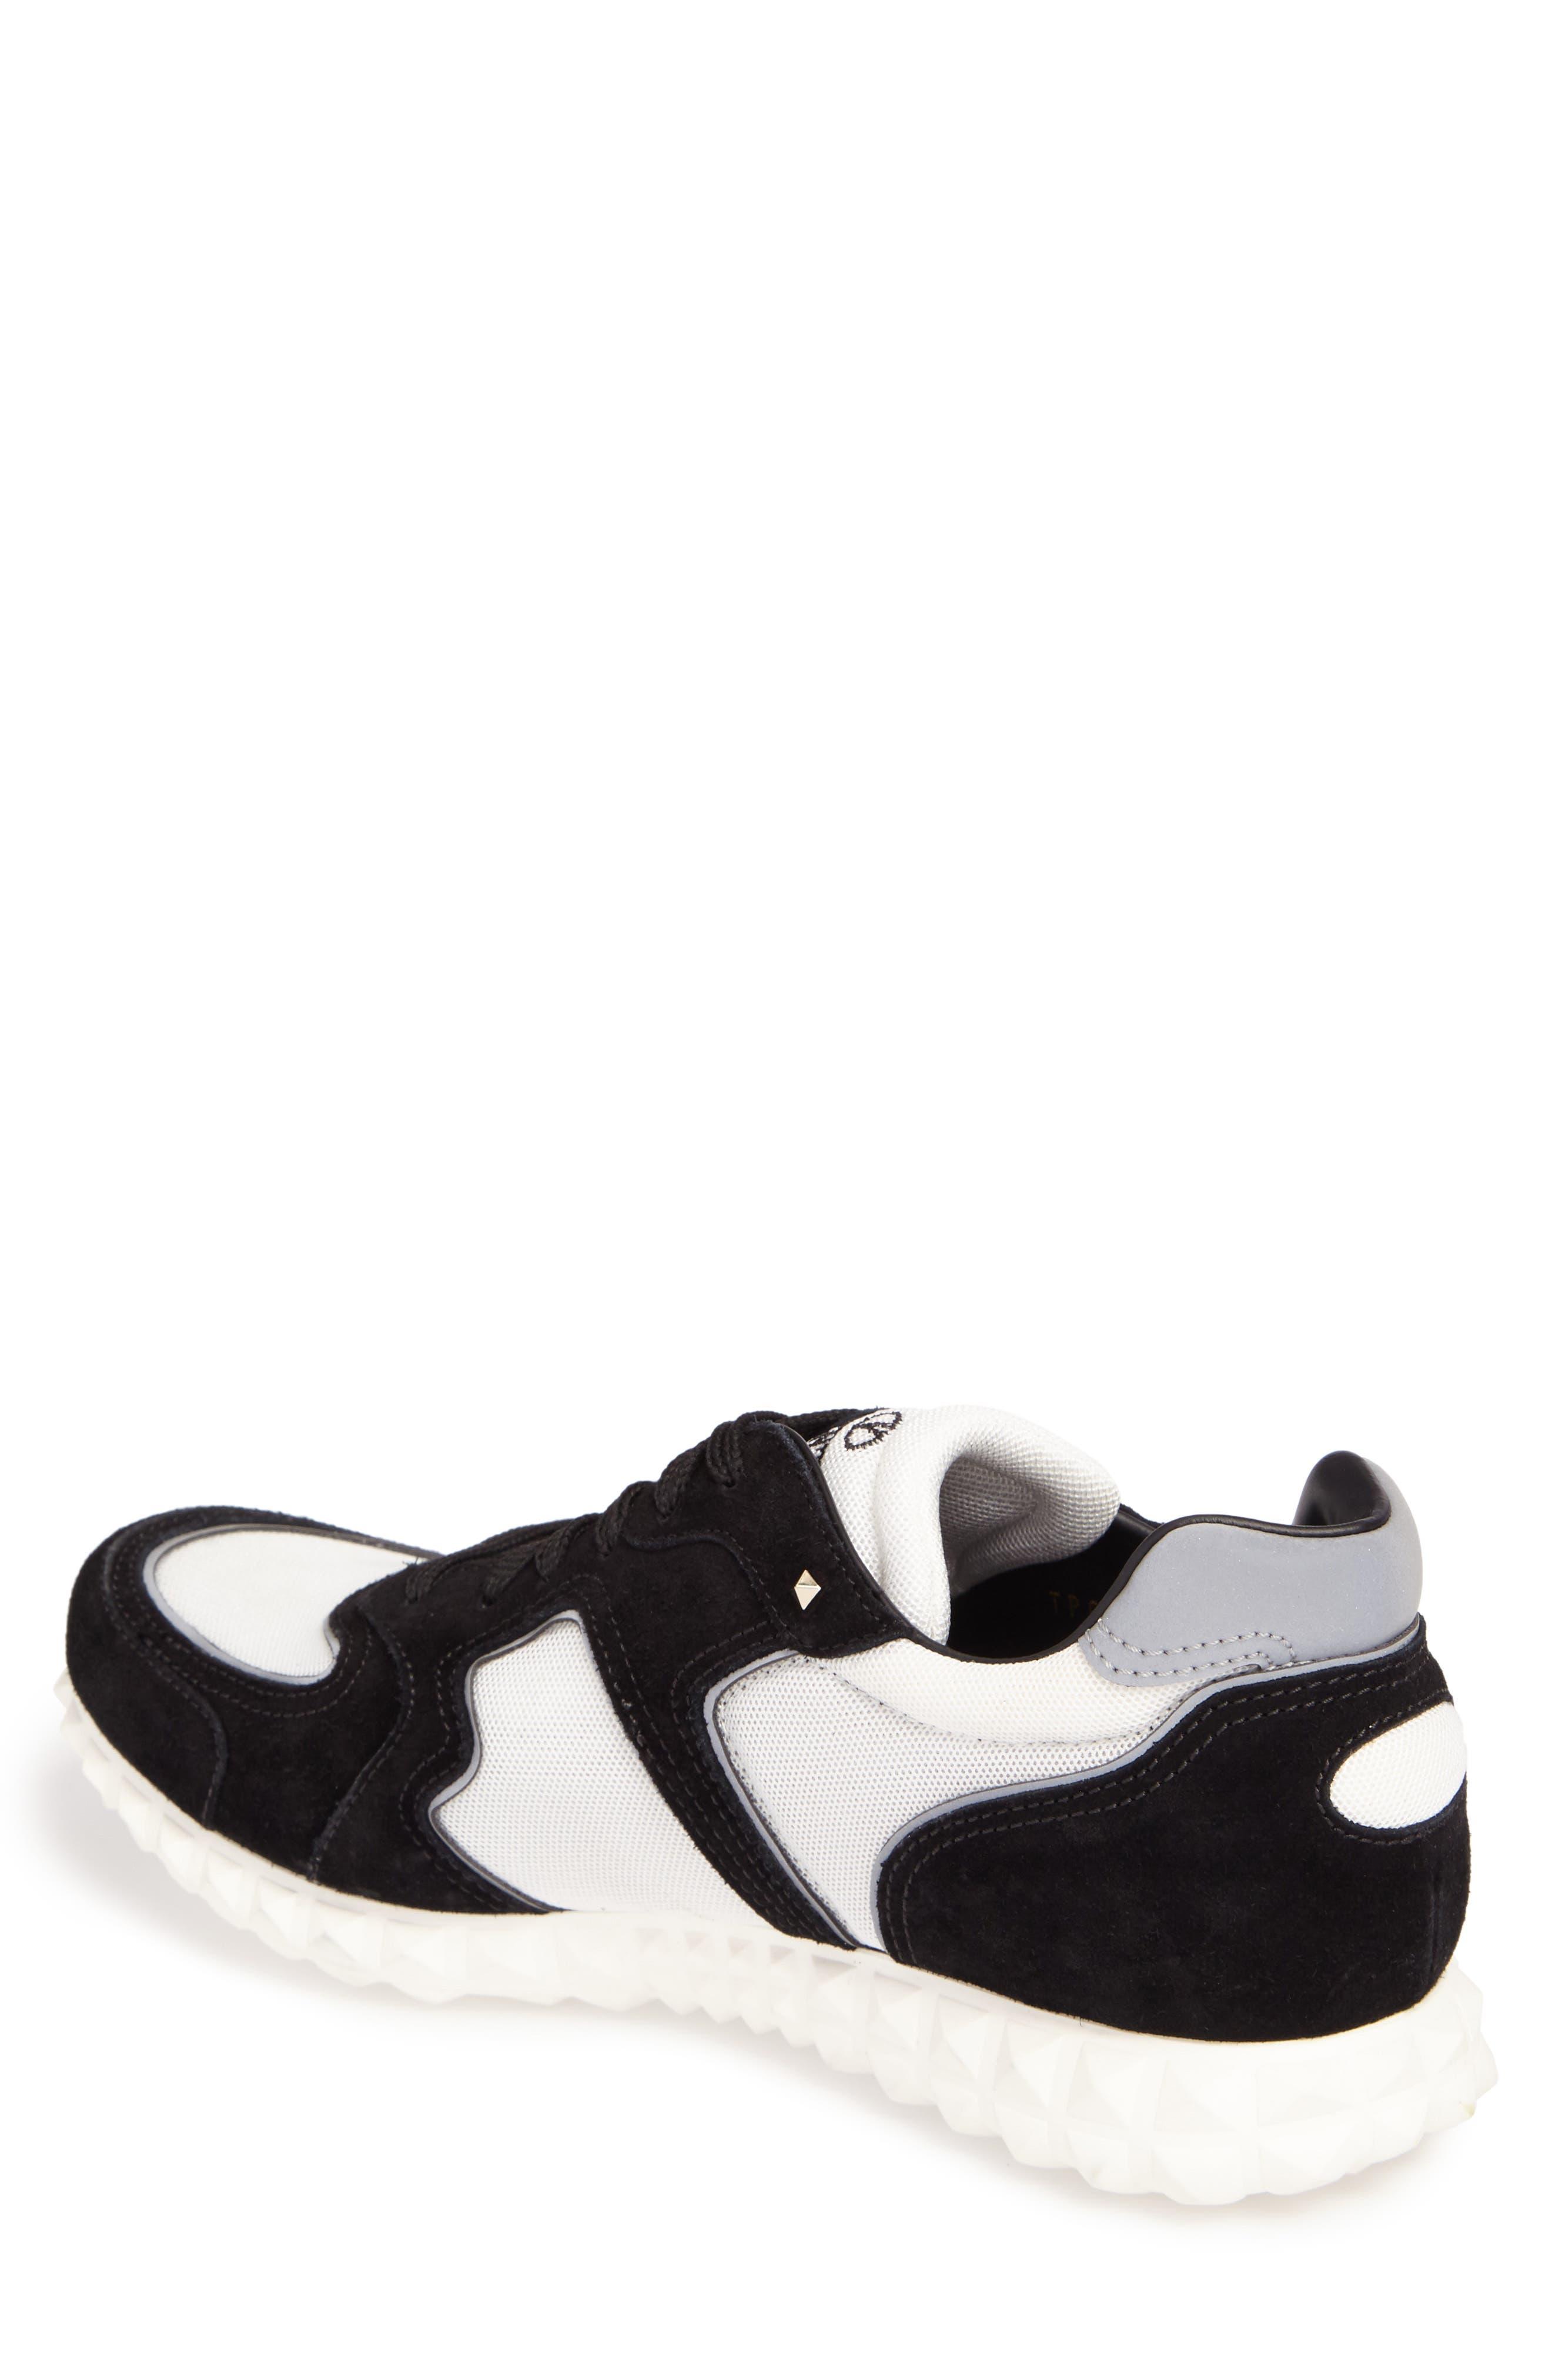 Soul AM Sneaker,                             Alternate thumbnail 2, color,                             103